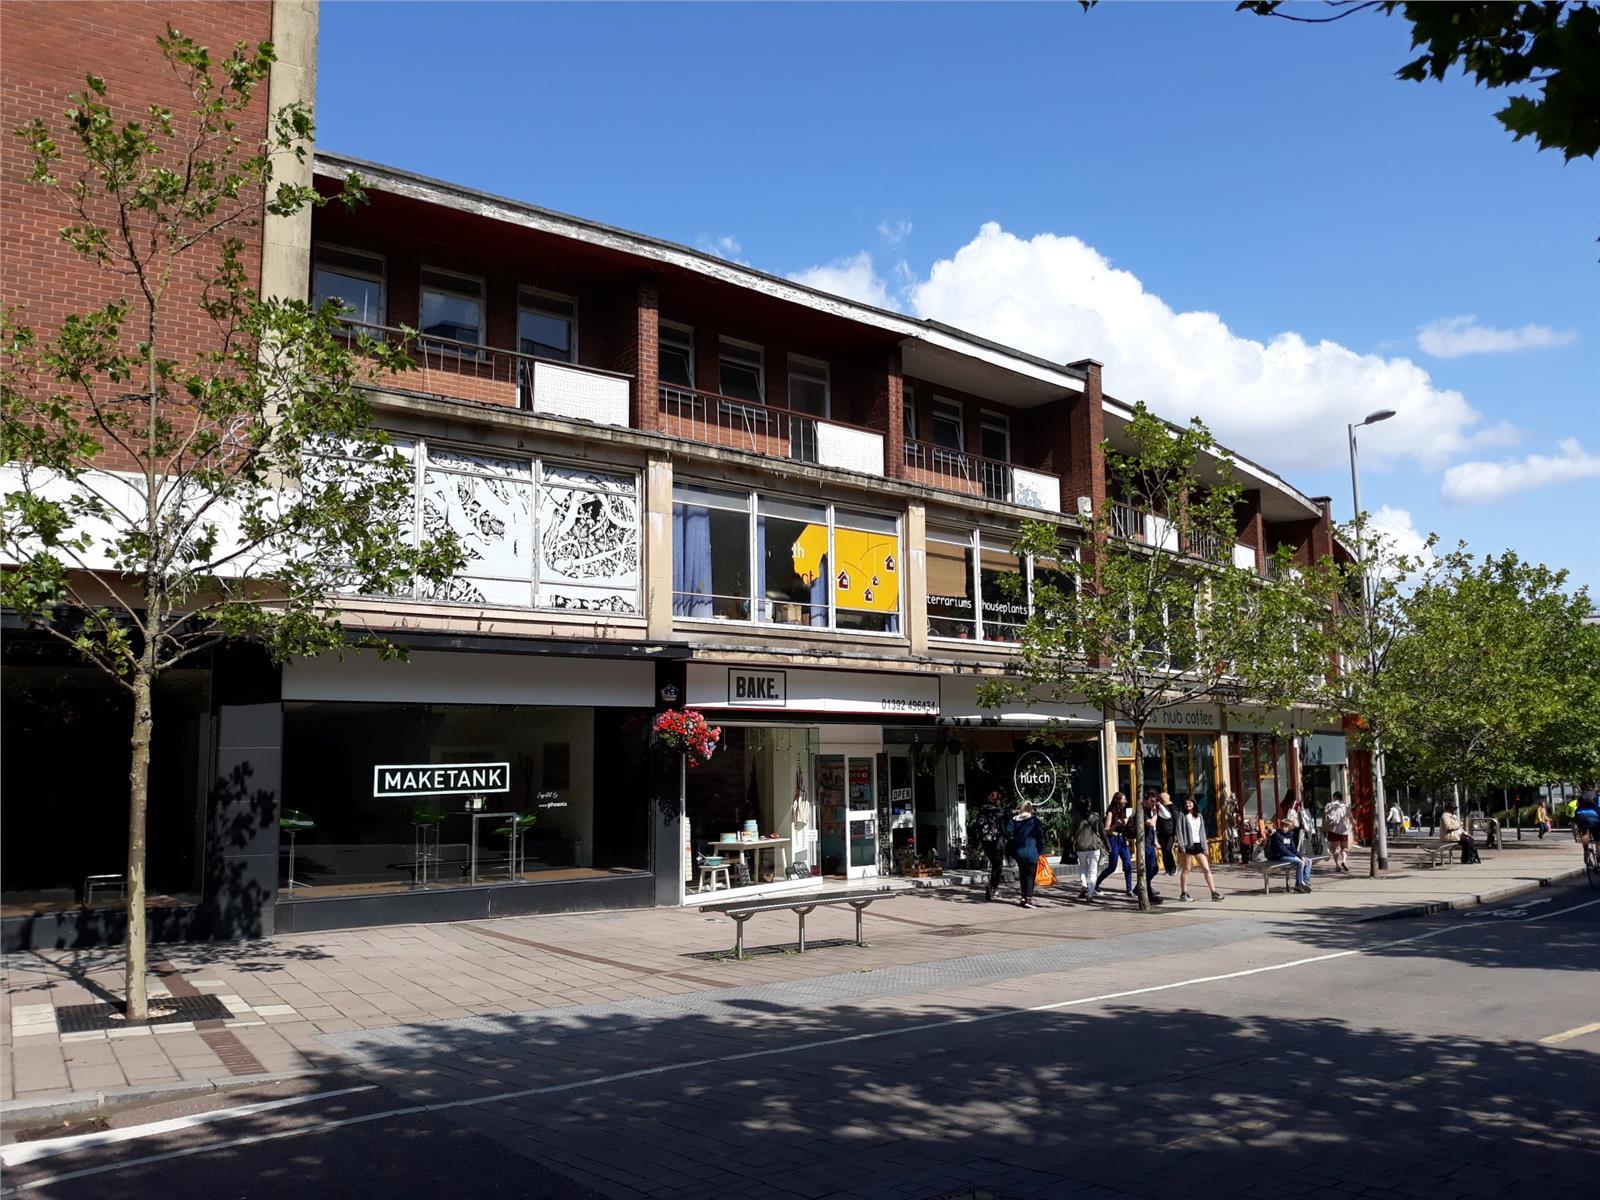 21 Paris Street, Exeter, South West, EX1 2JB